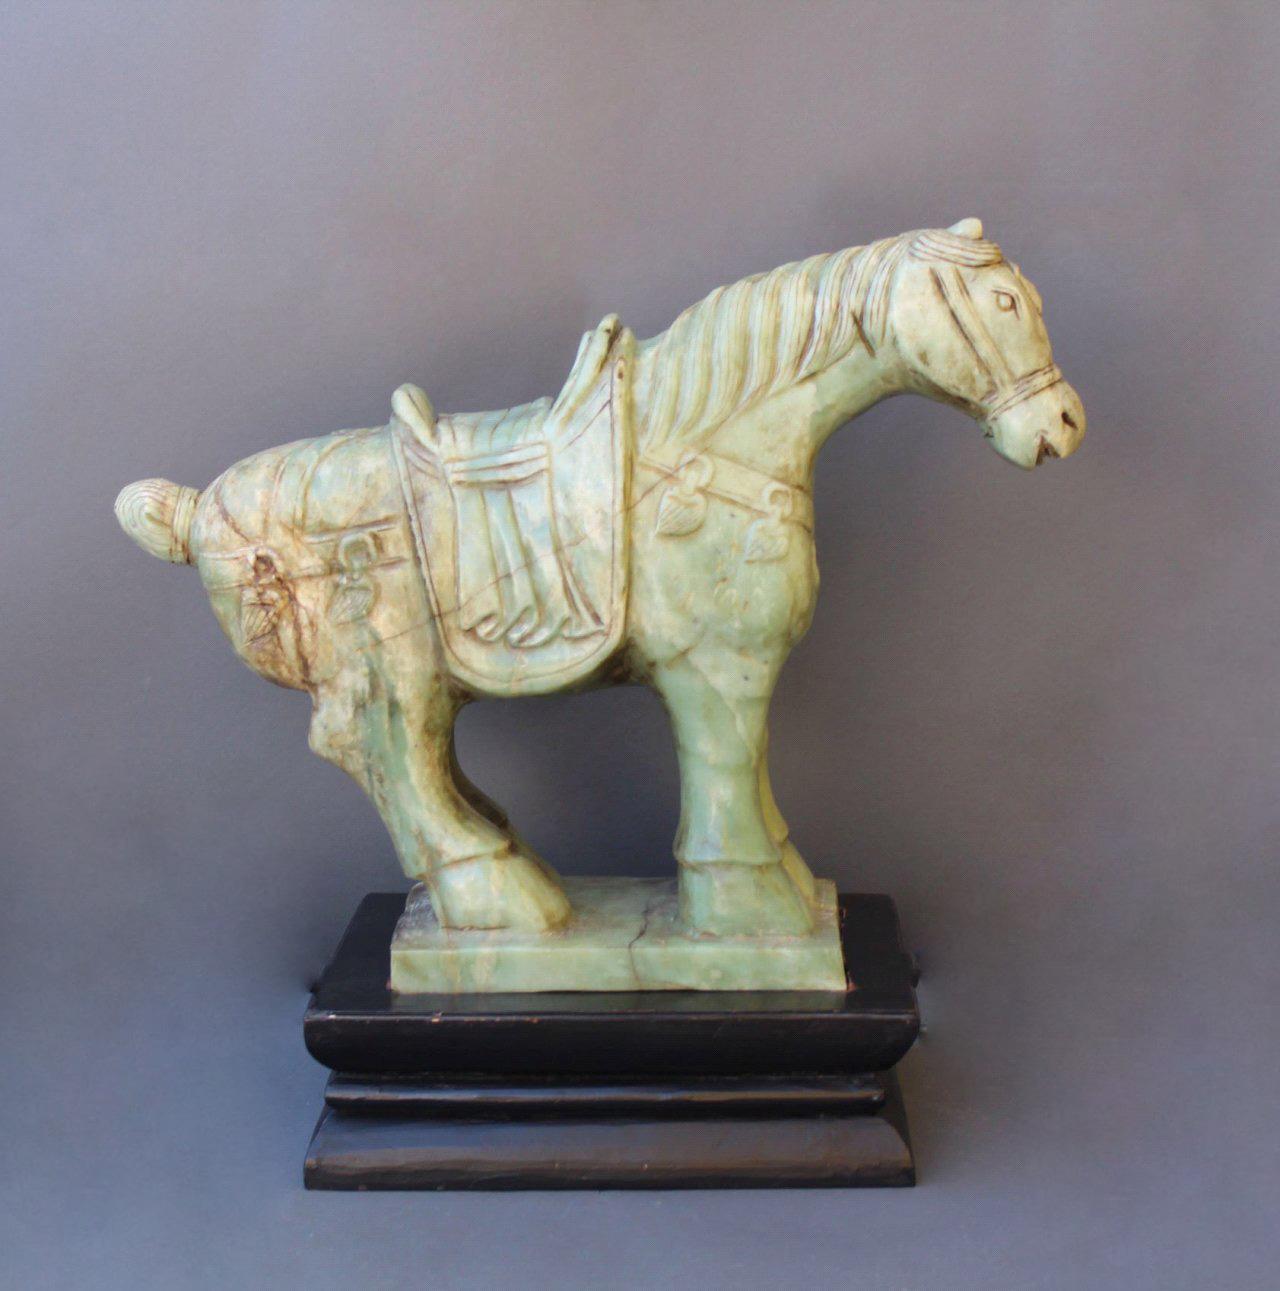 Sehr große Pferdefigur, Serpentin-Jade-2